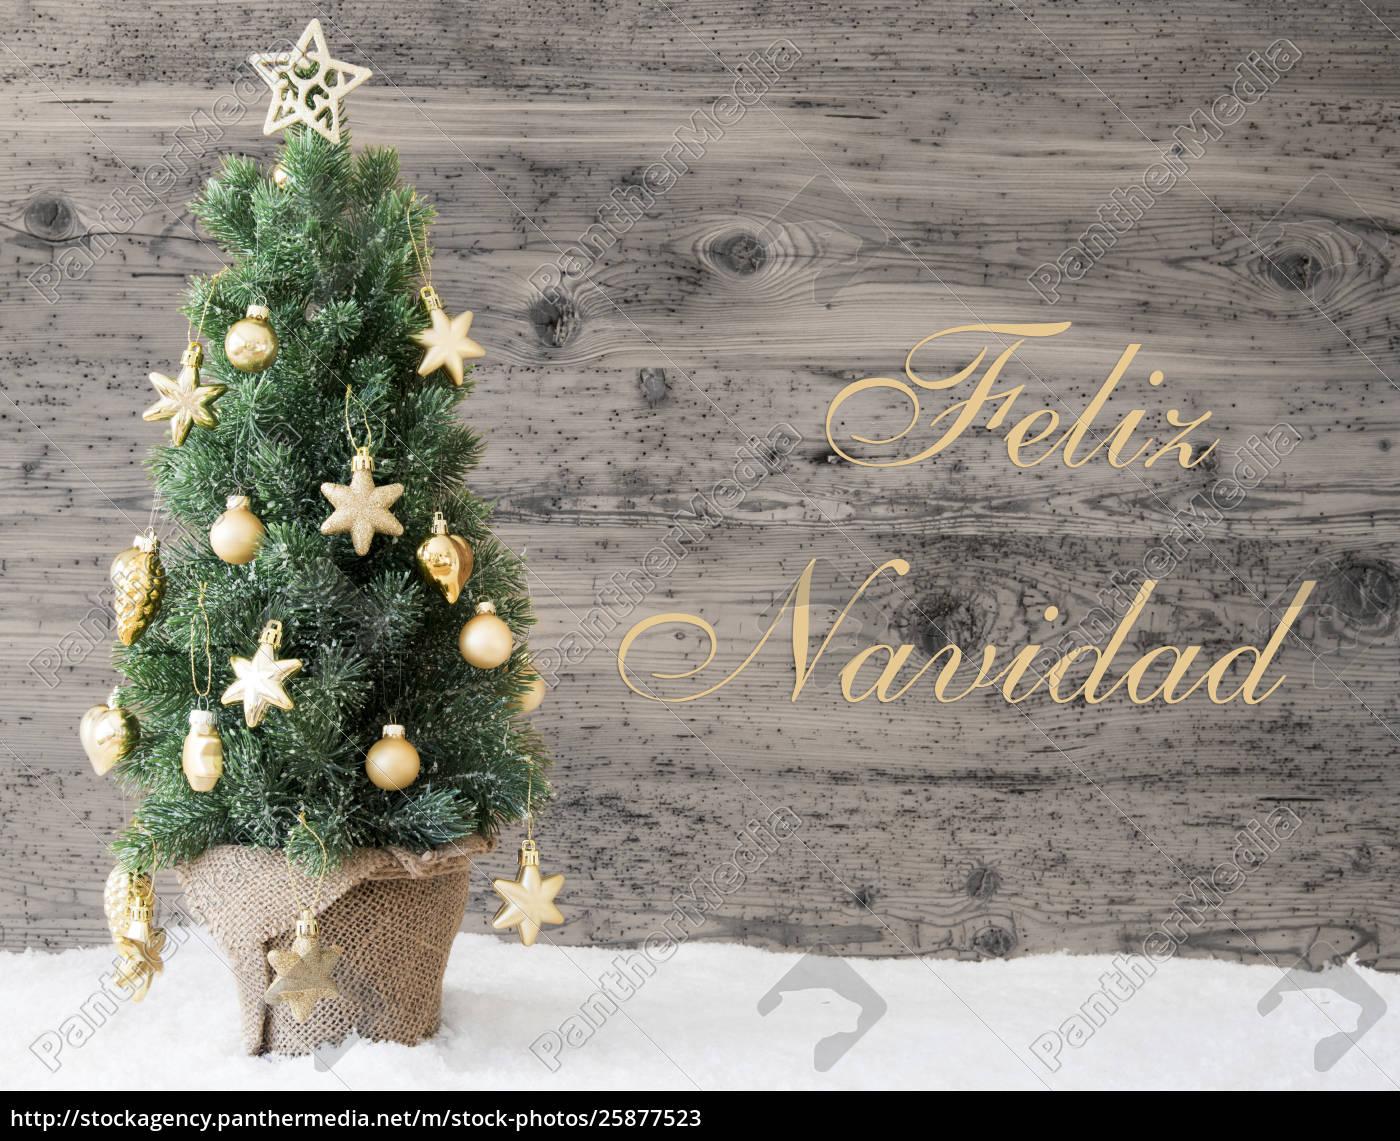 ~golden decorated tree  feliz navidad means 25877523 high